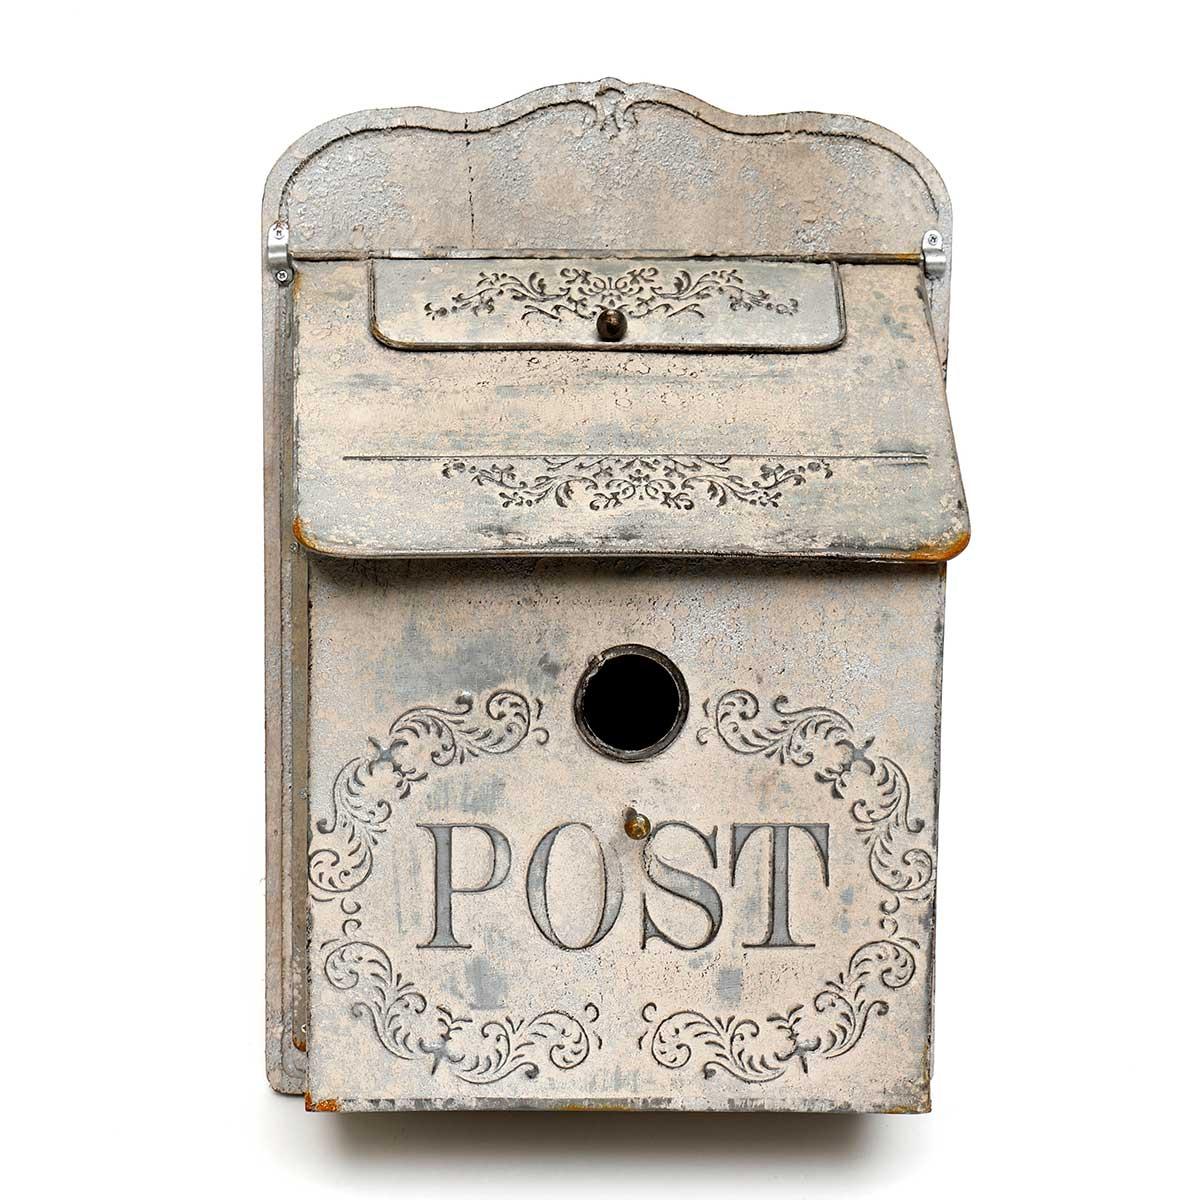 PEWTER METAL DECORATIVE POST BOX BIRDHOUSE ON WOOD